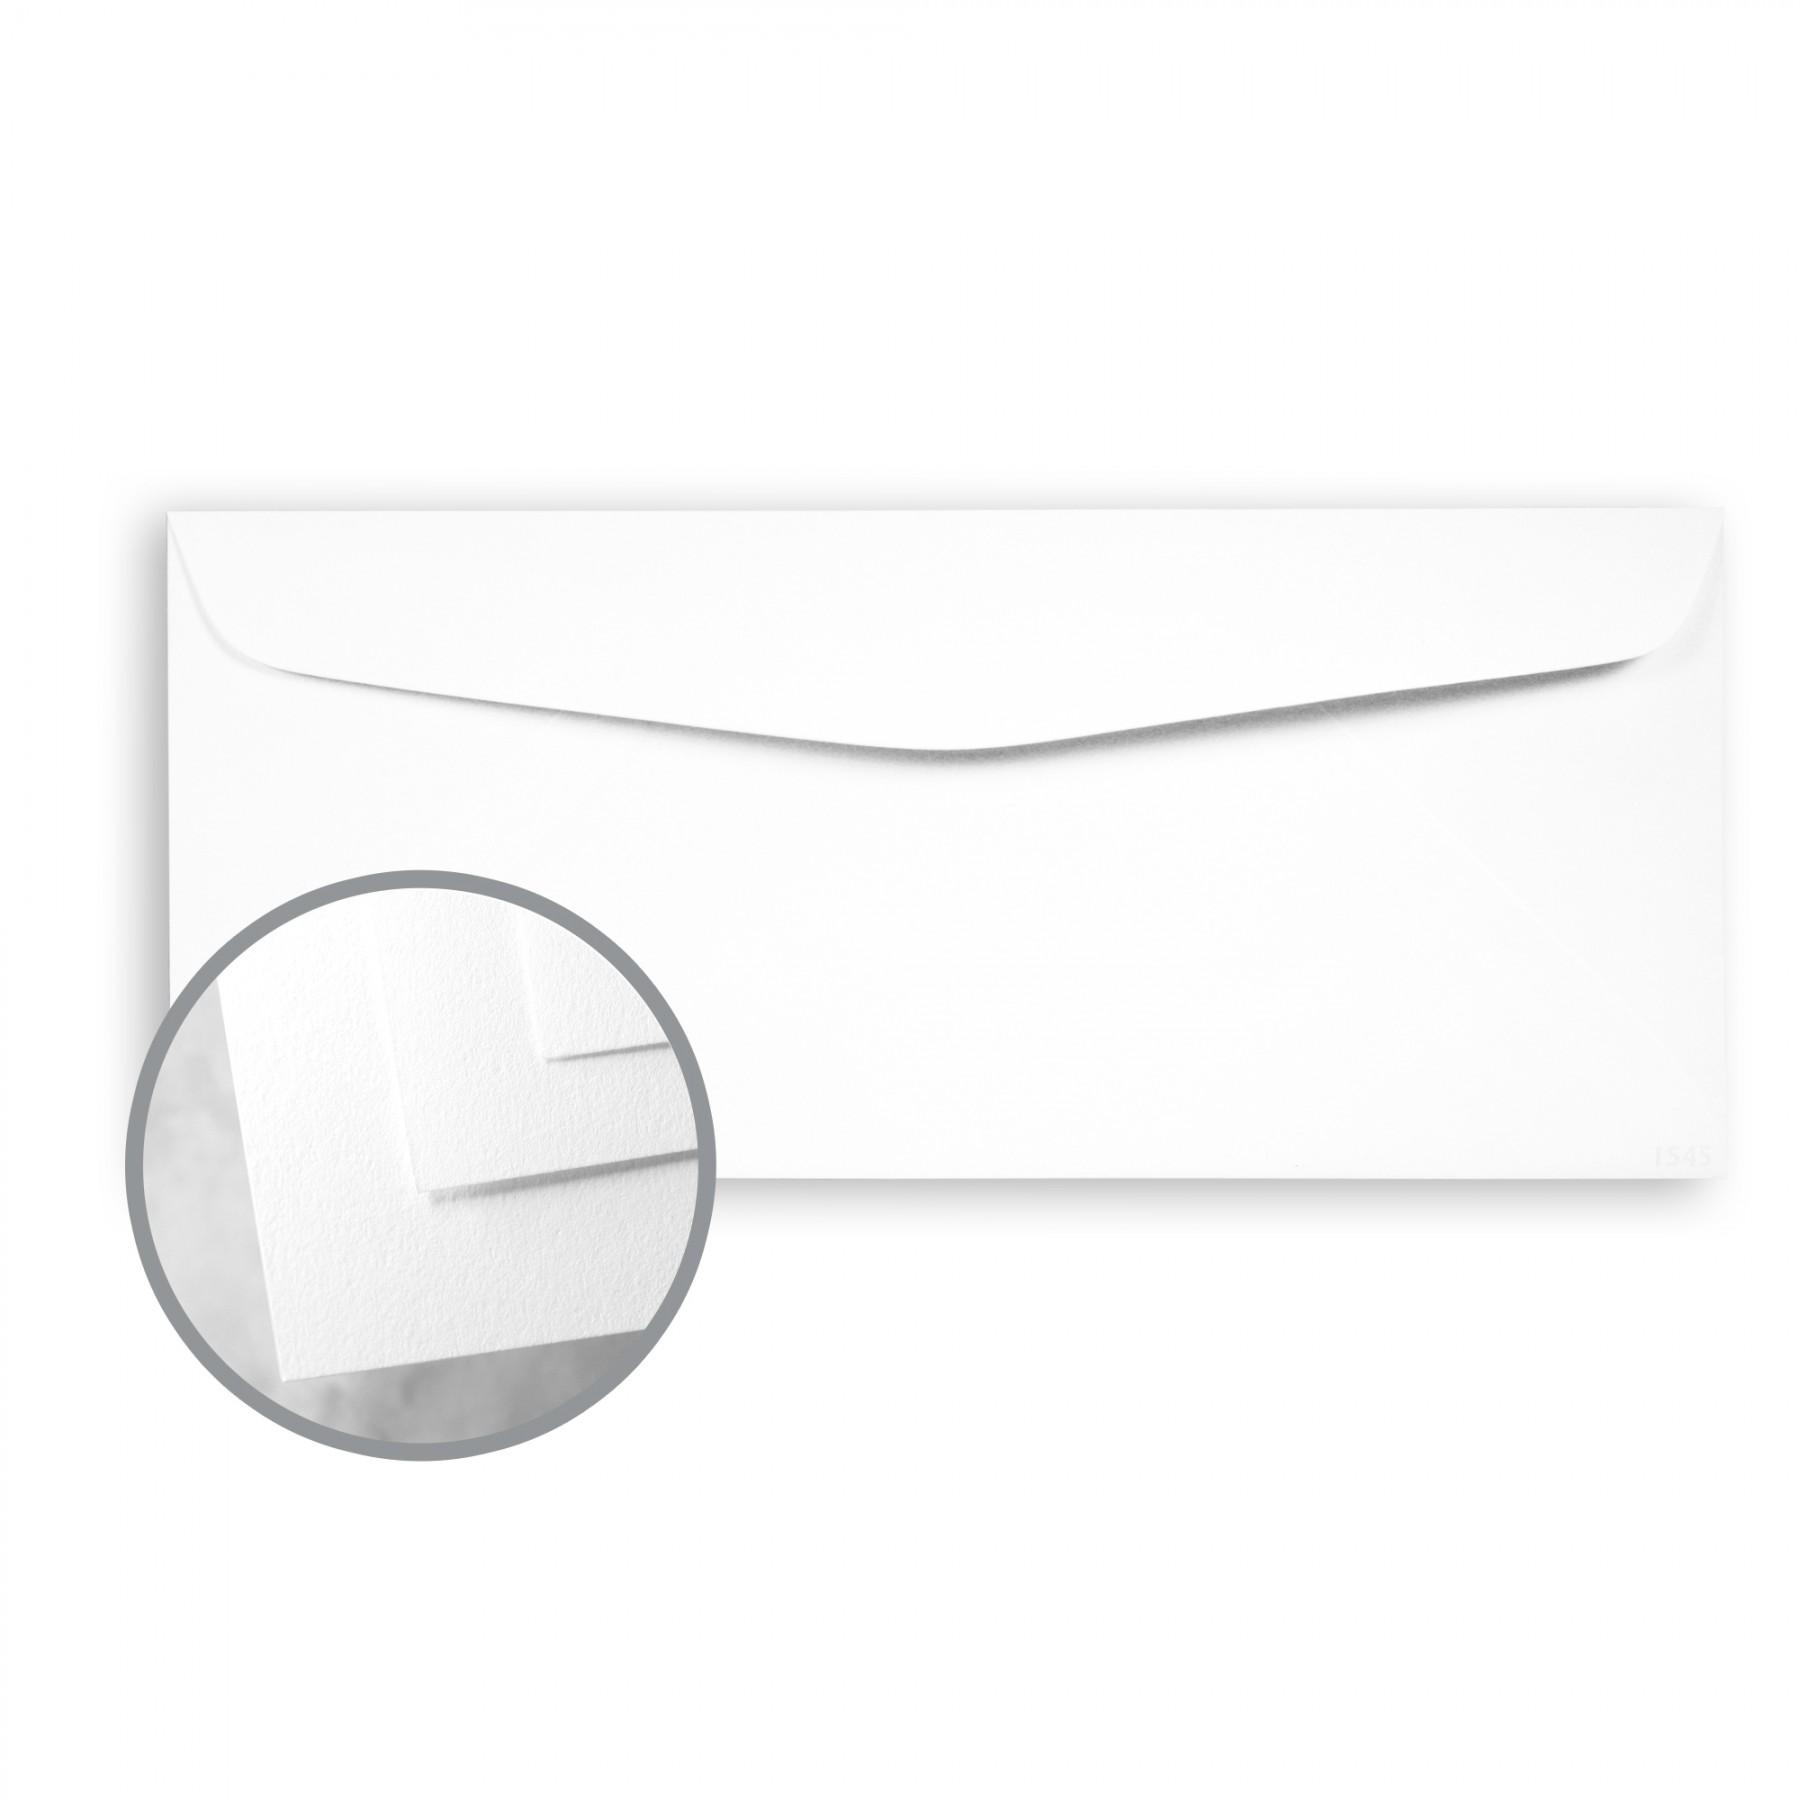 custom watermarked bond paper